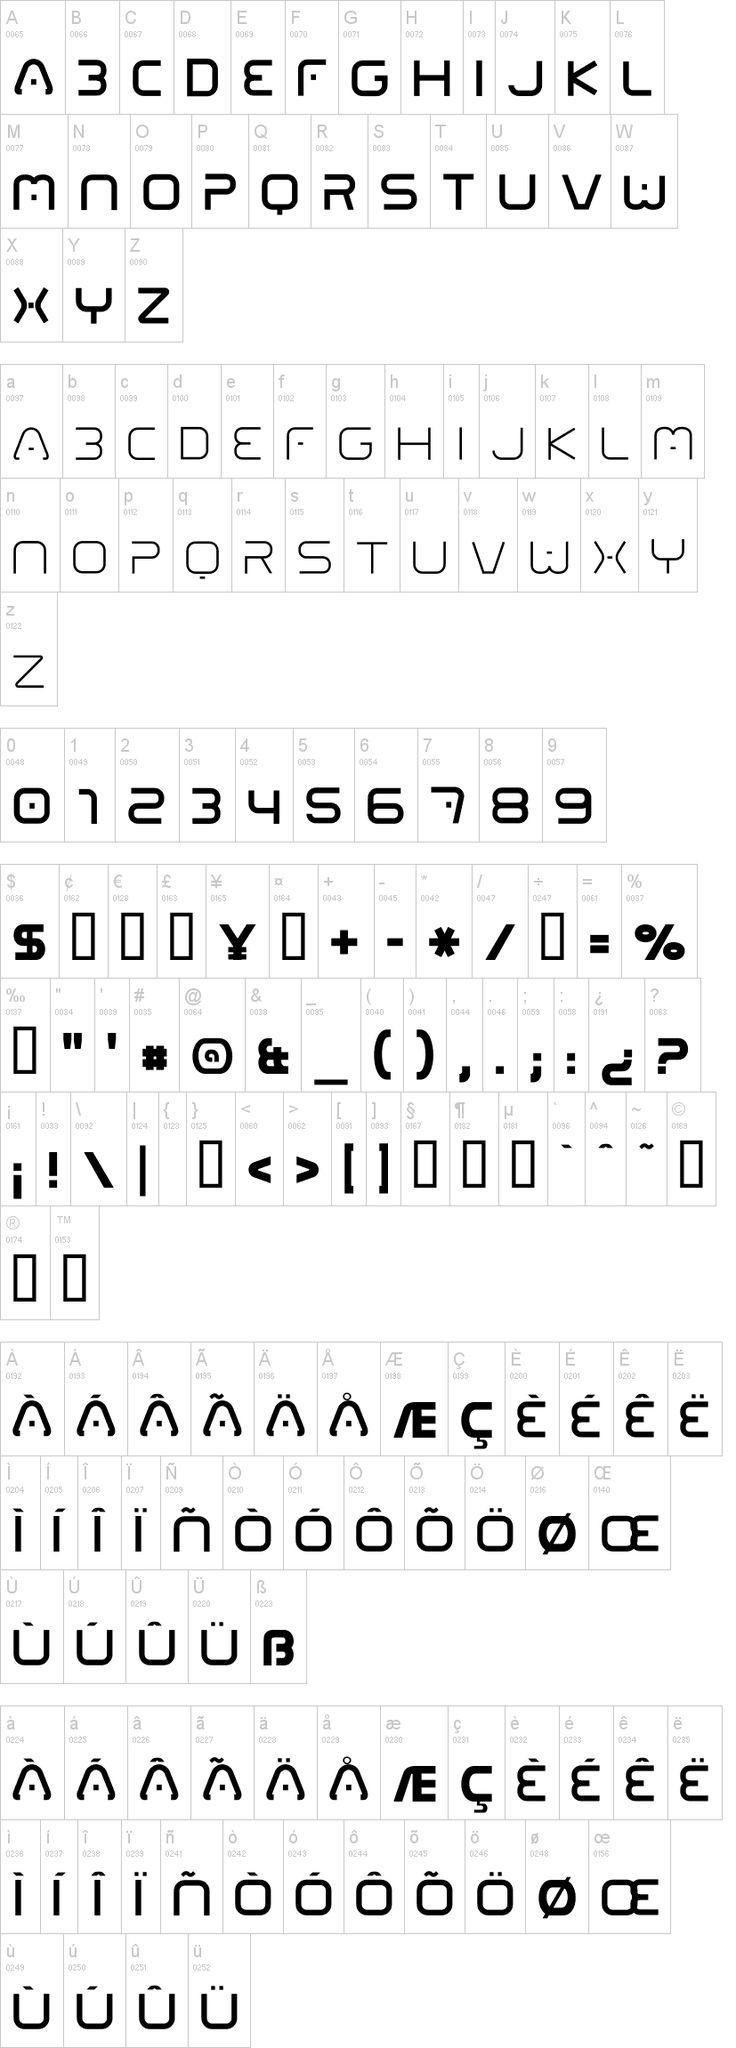 01 Digitall Typography logo, Fonts, Dafont